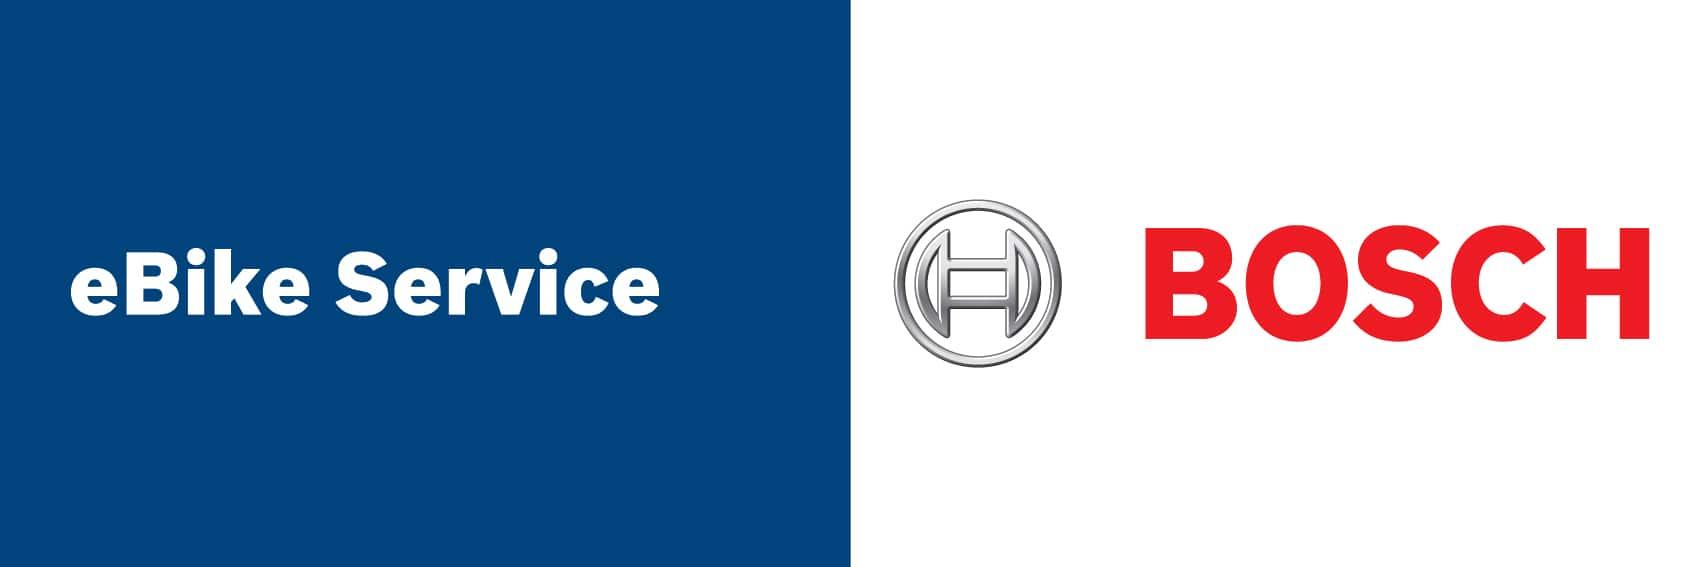 Bosch-eBike-Service